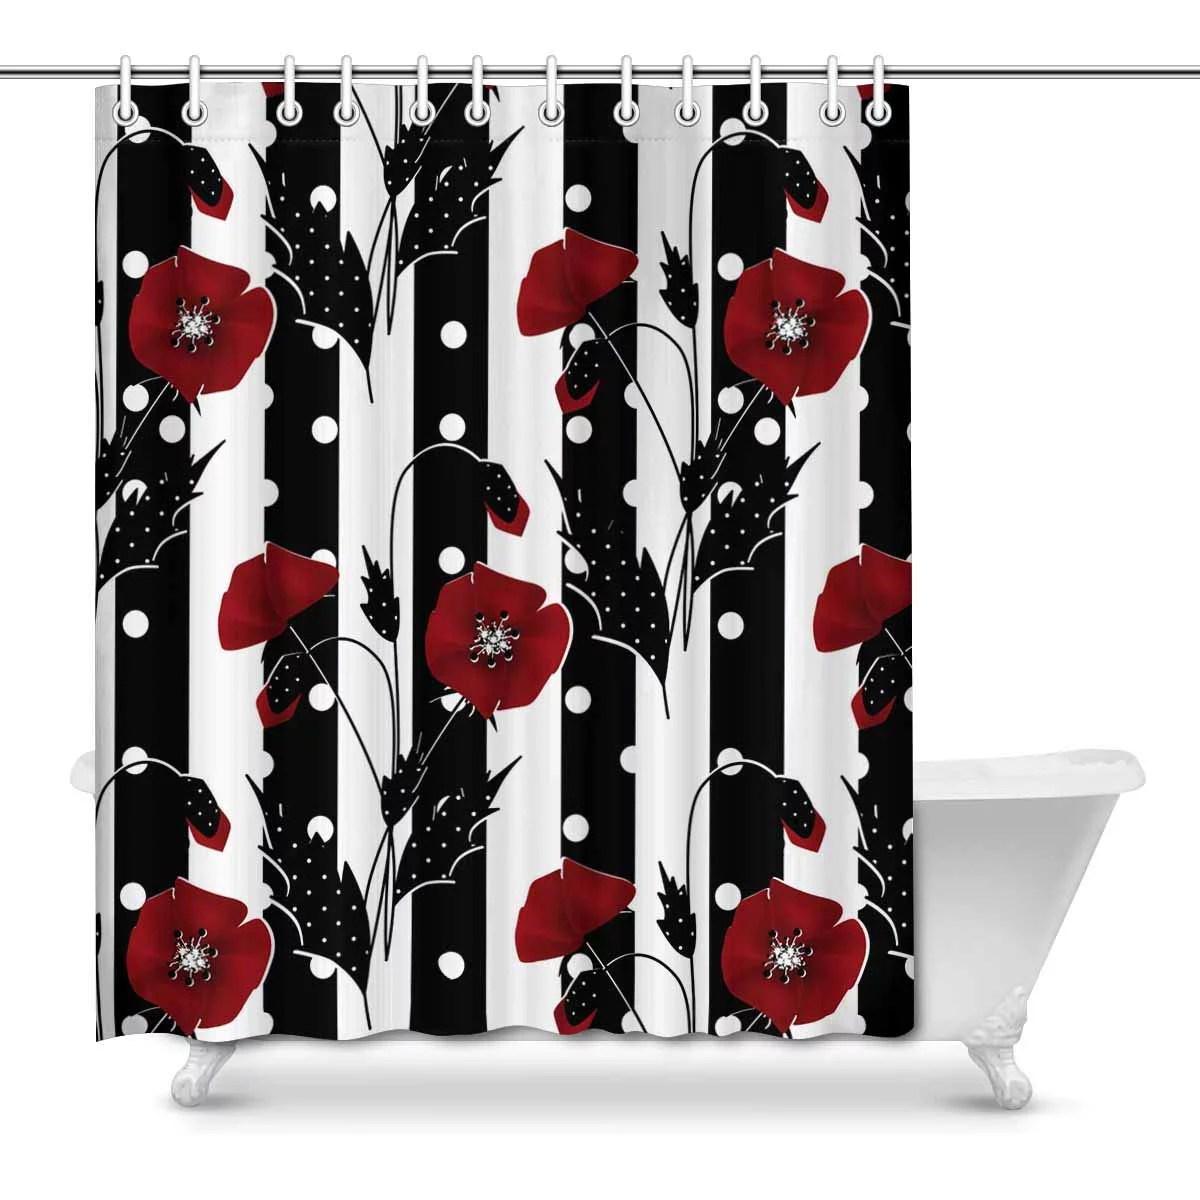 mkhert red poppies on black white stripes house decor shower curtain for bathroom decorative fabric bath curtain set 66x72 inch walmart com